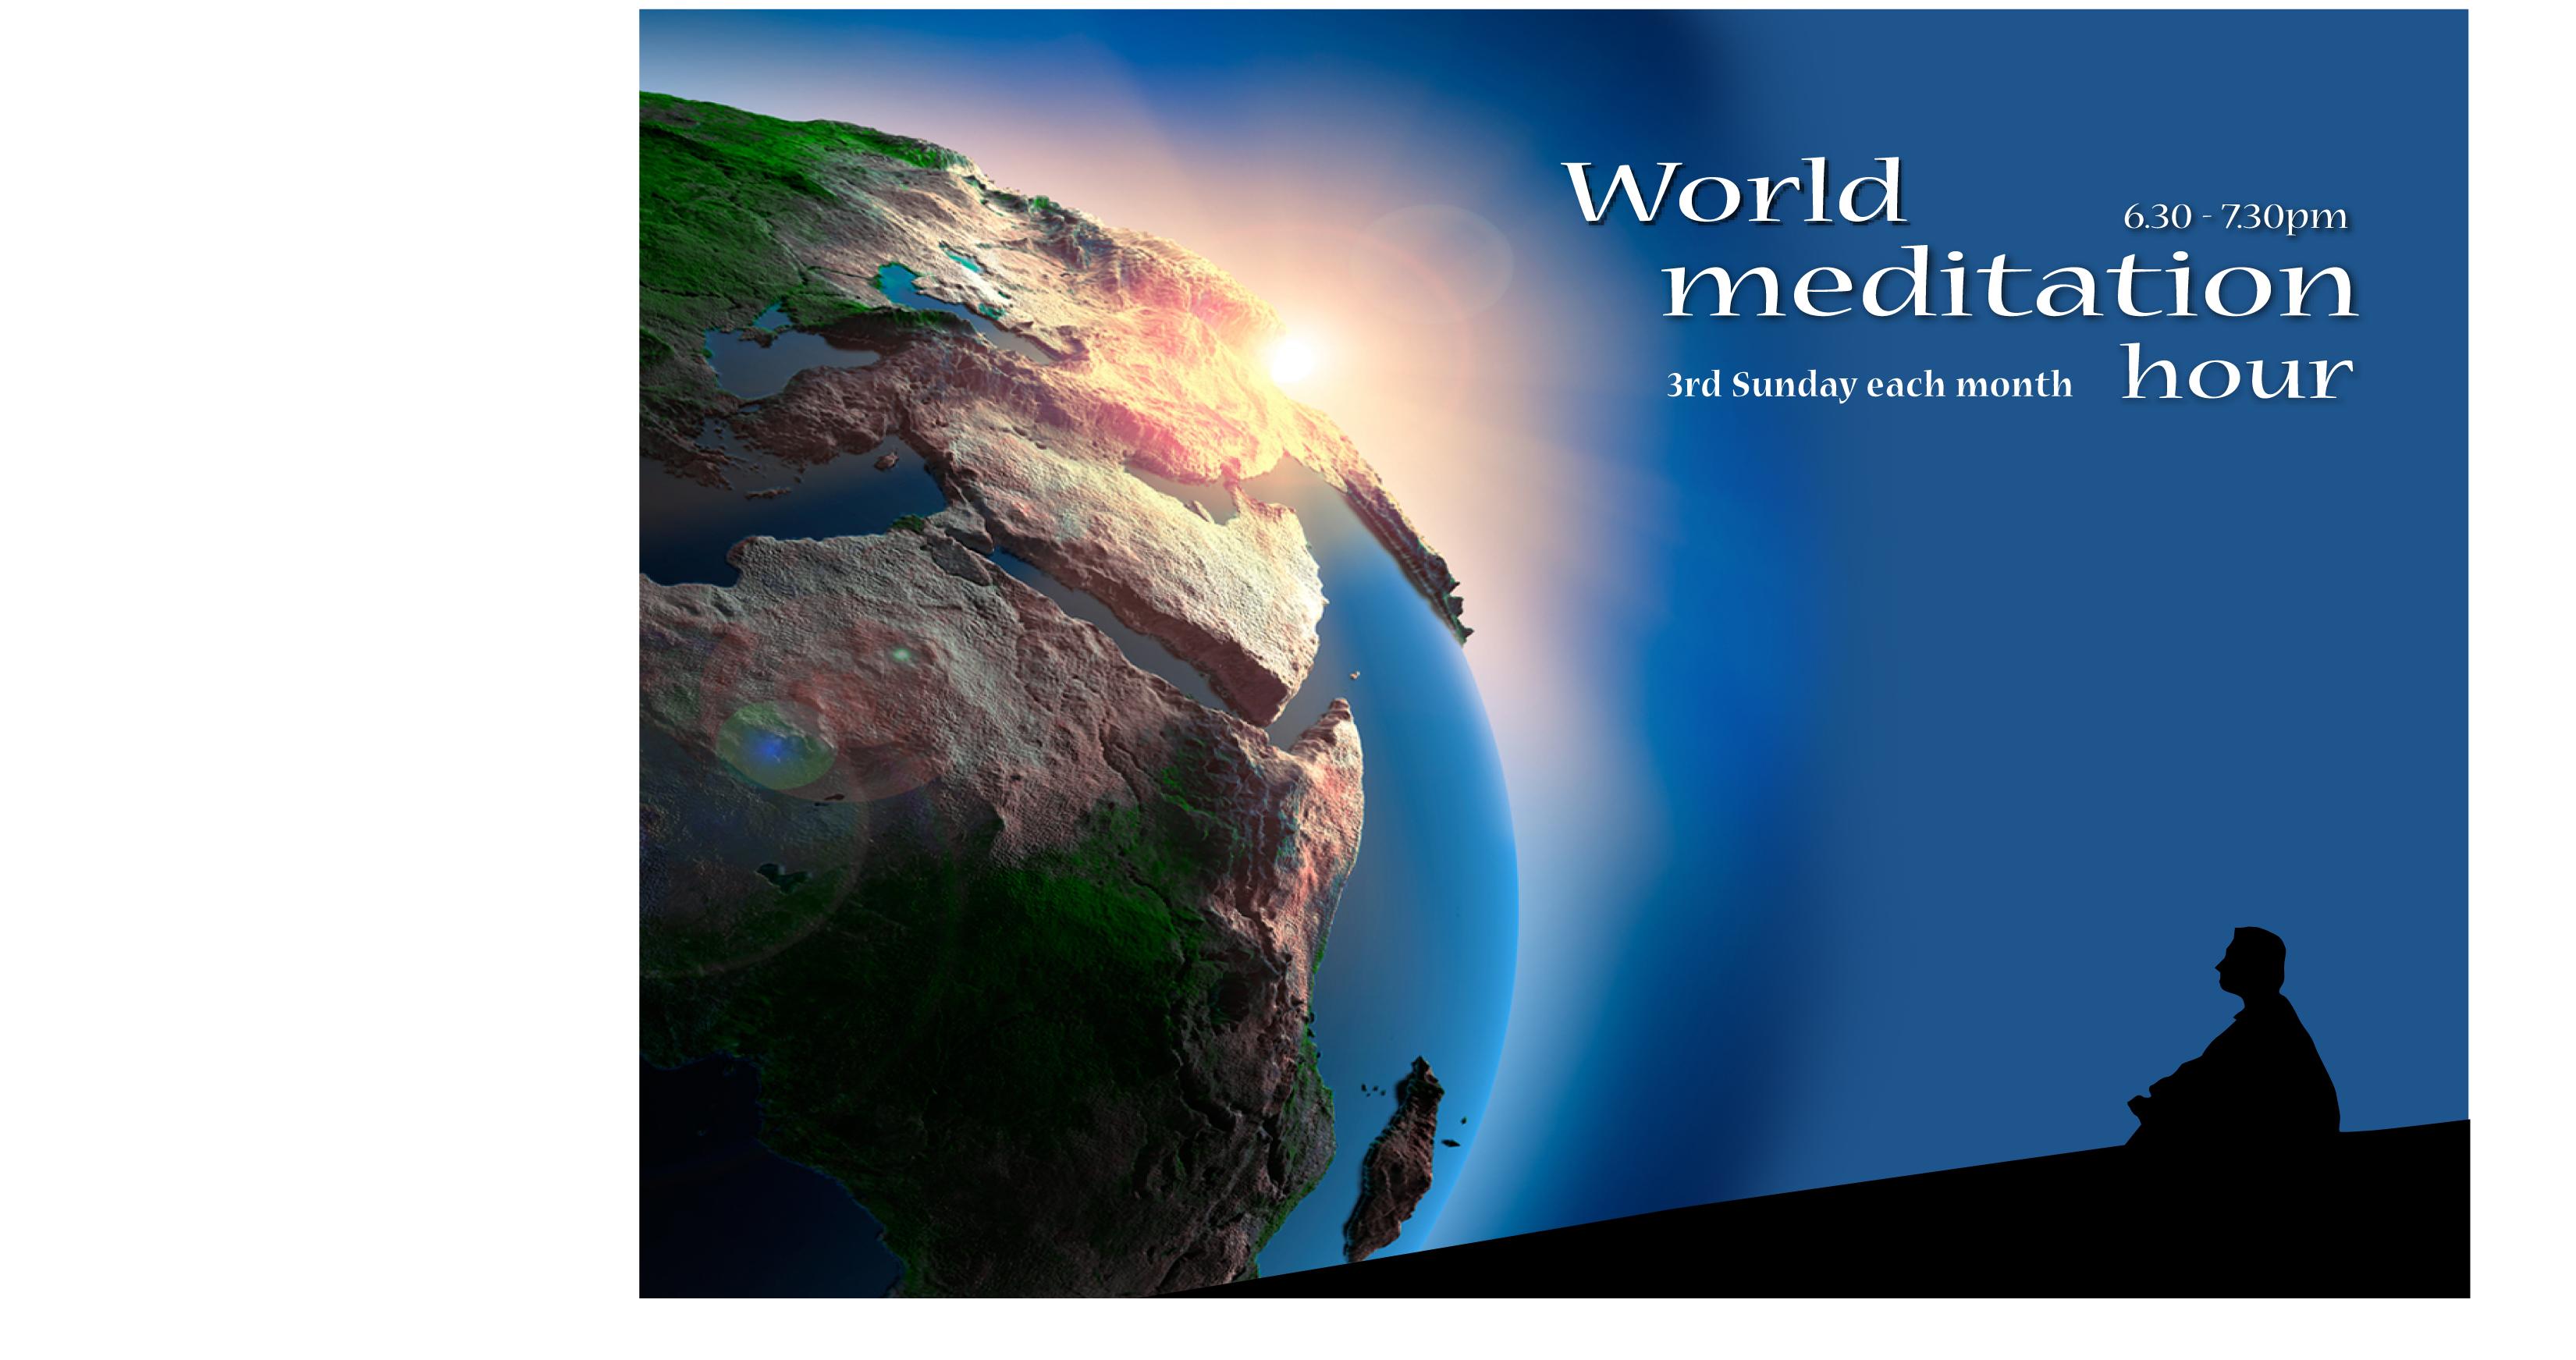 Fitness & Health Classes World Meditation Hour - Join 9,000 BK Centres in guided meditation by Brahma Kumaris Australia